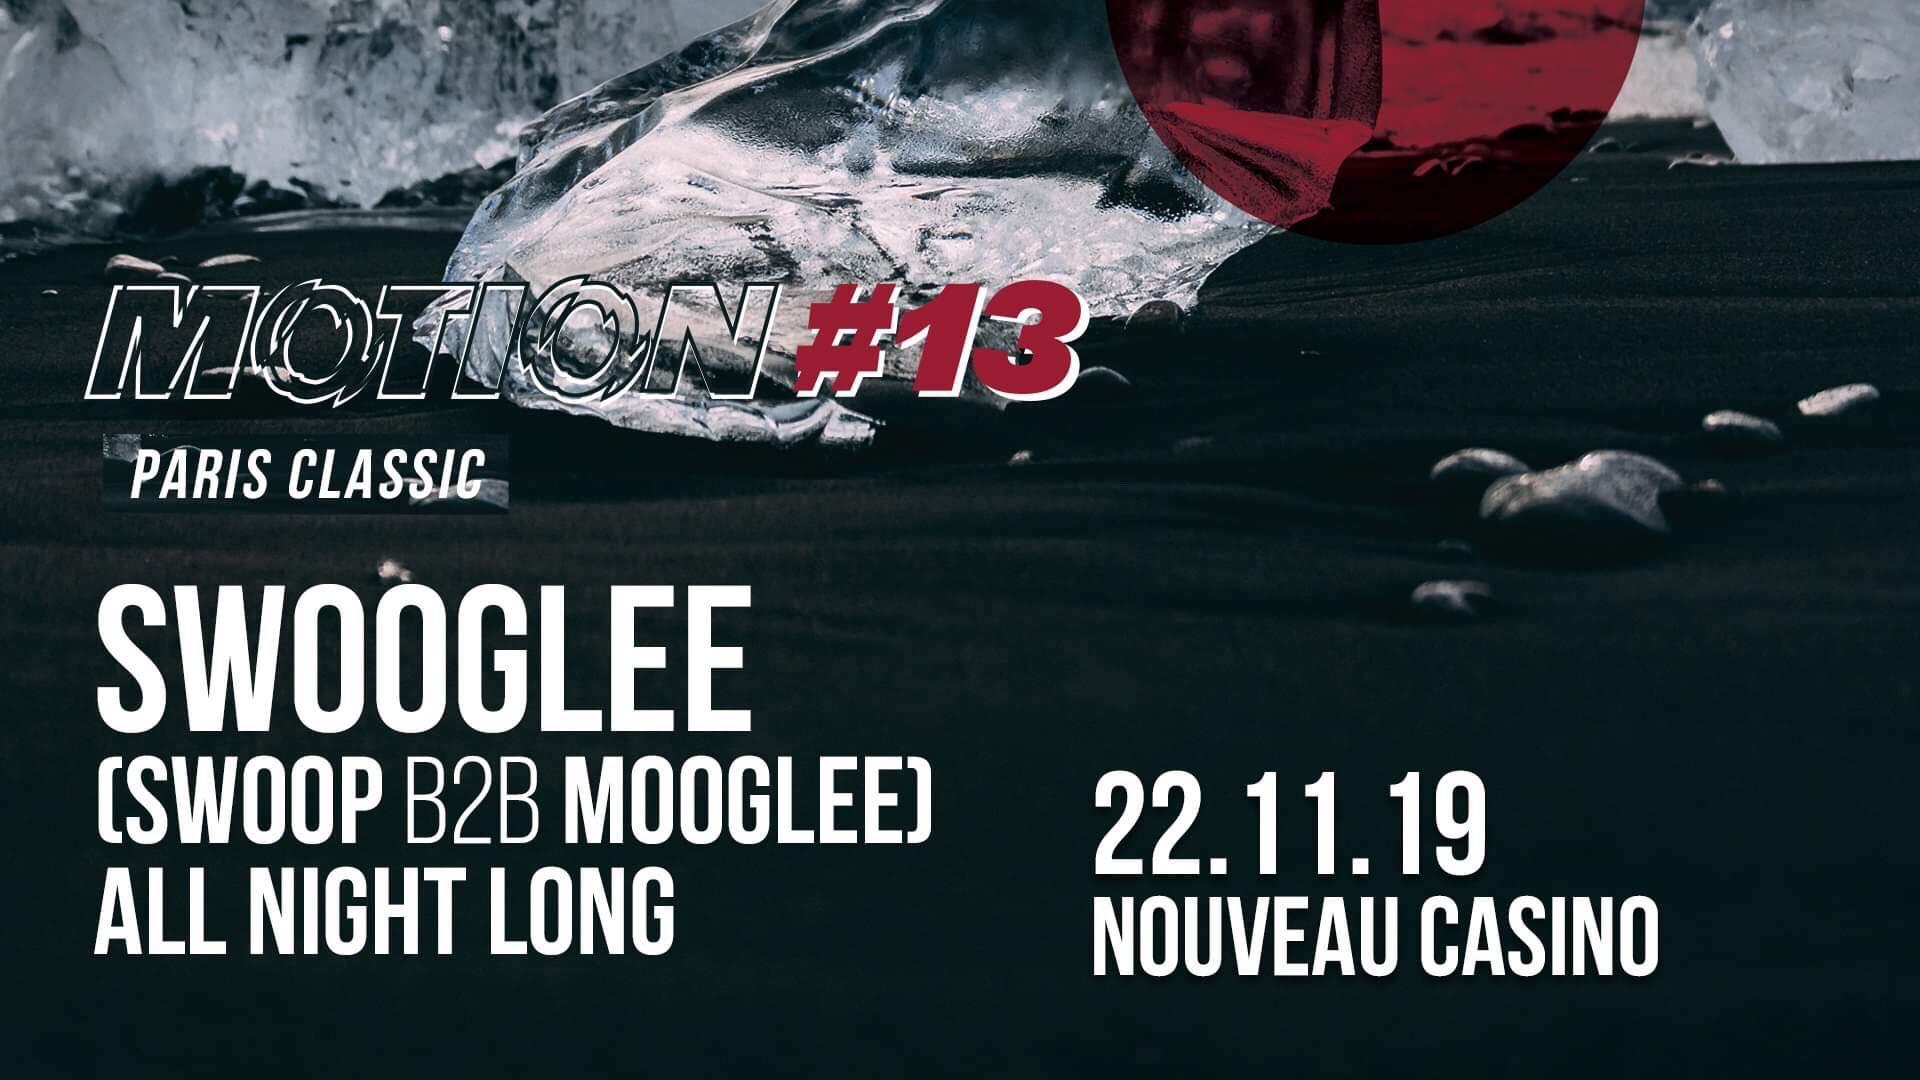 Motion #13 - Swooglee All Night Long